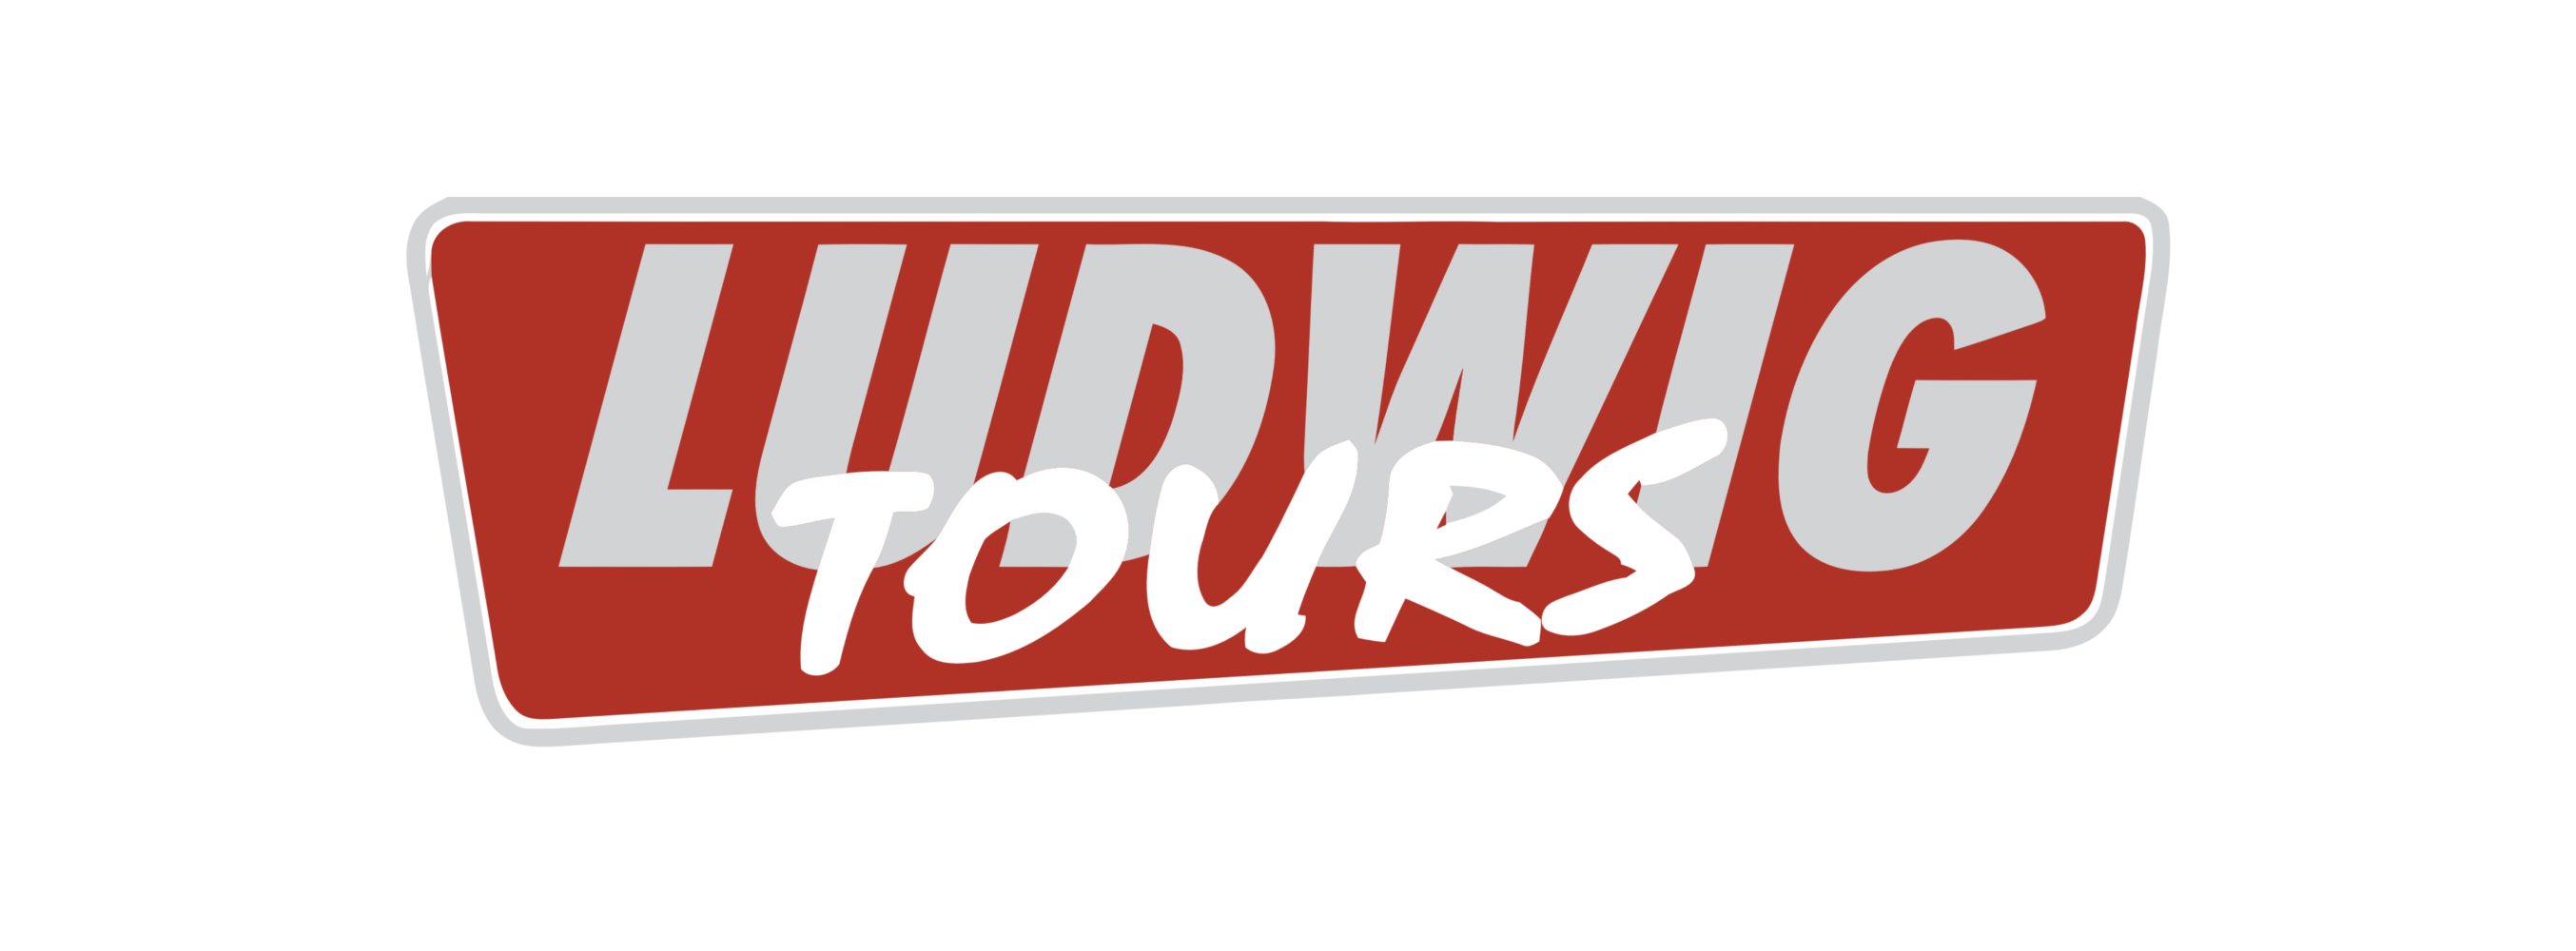 ludwigtourswebsite